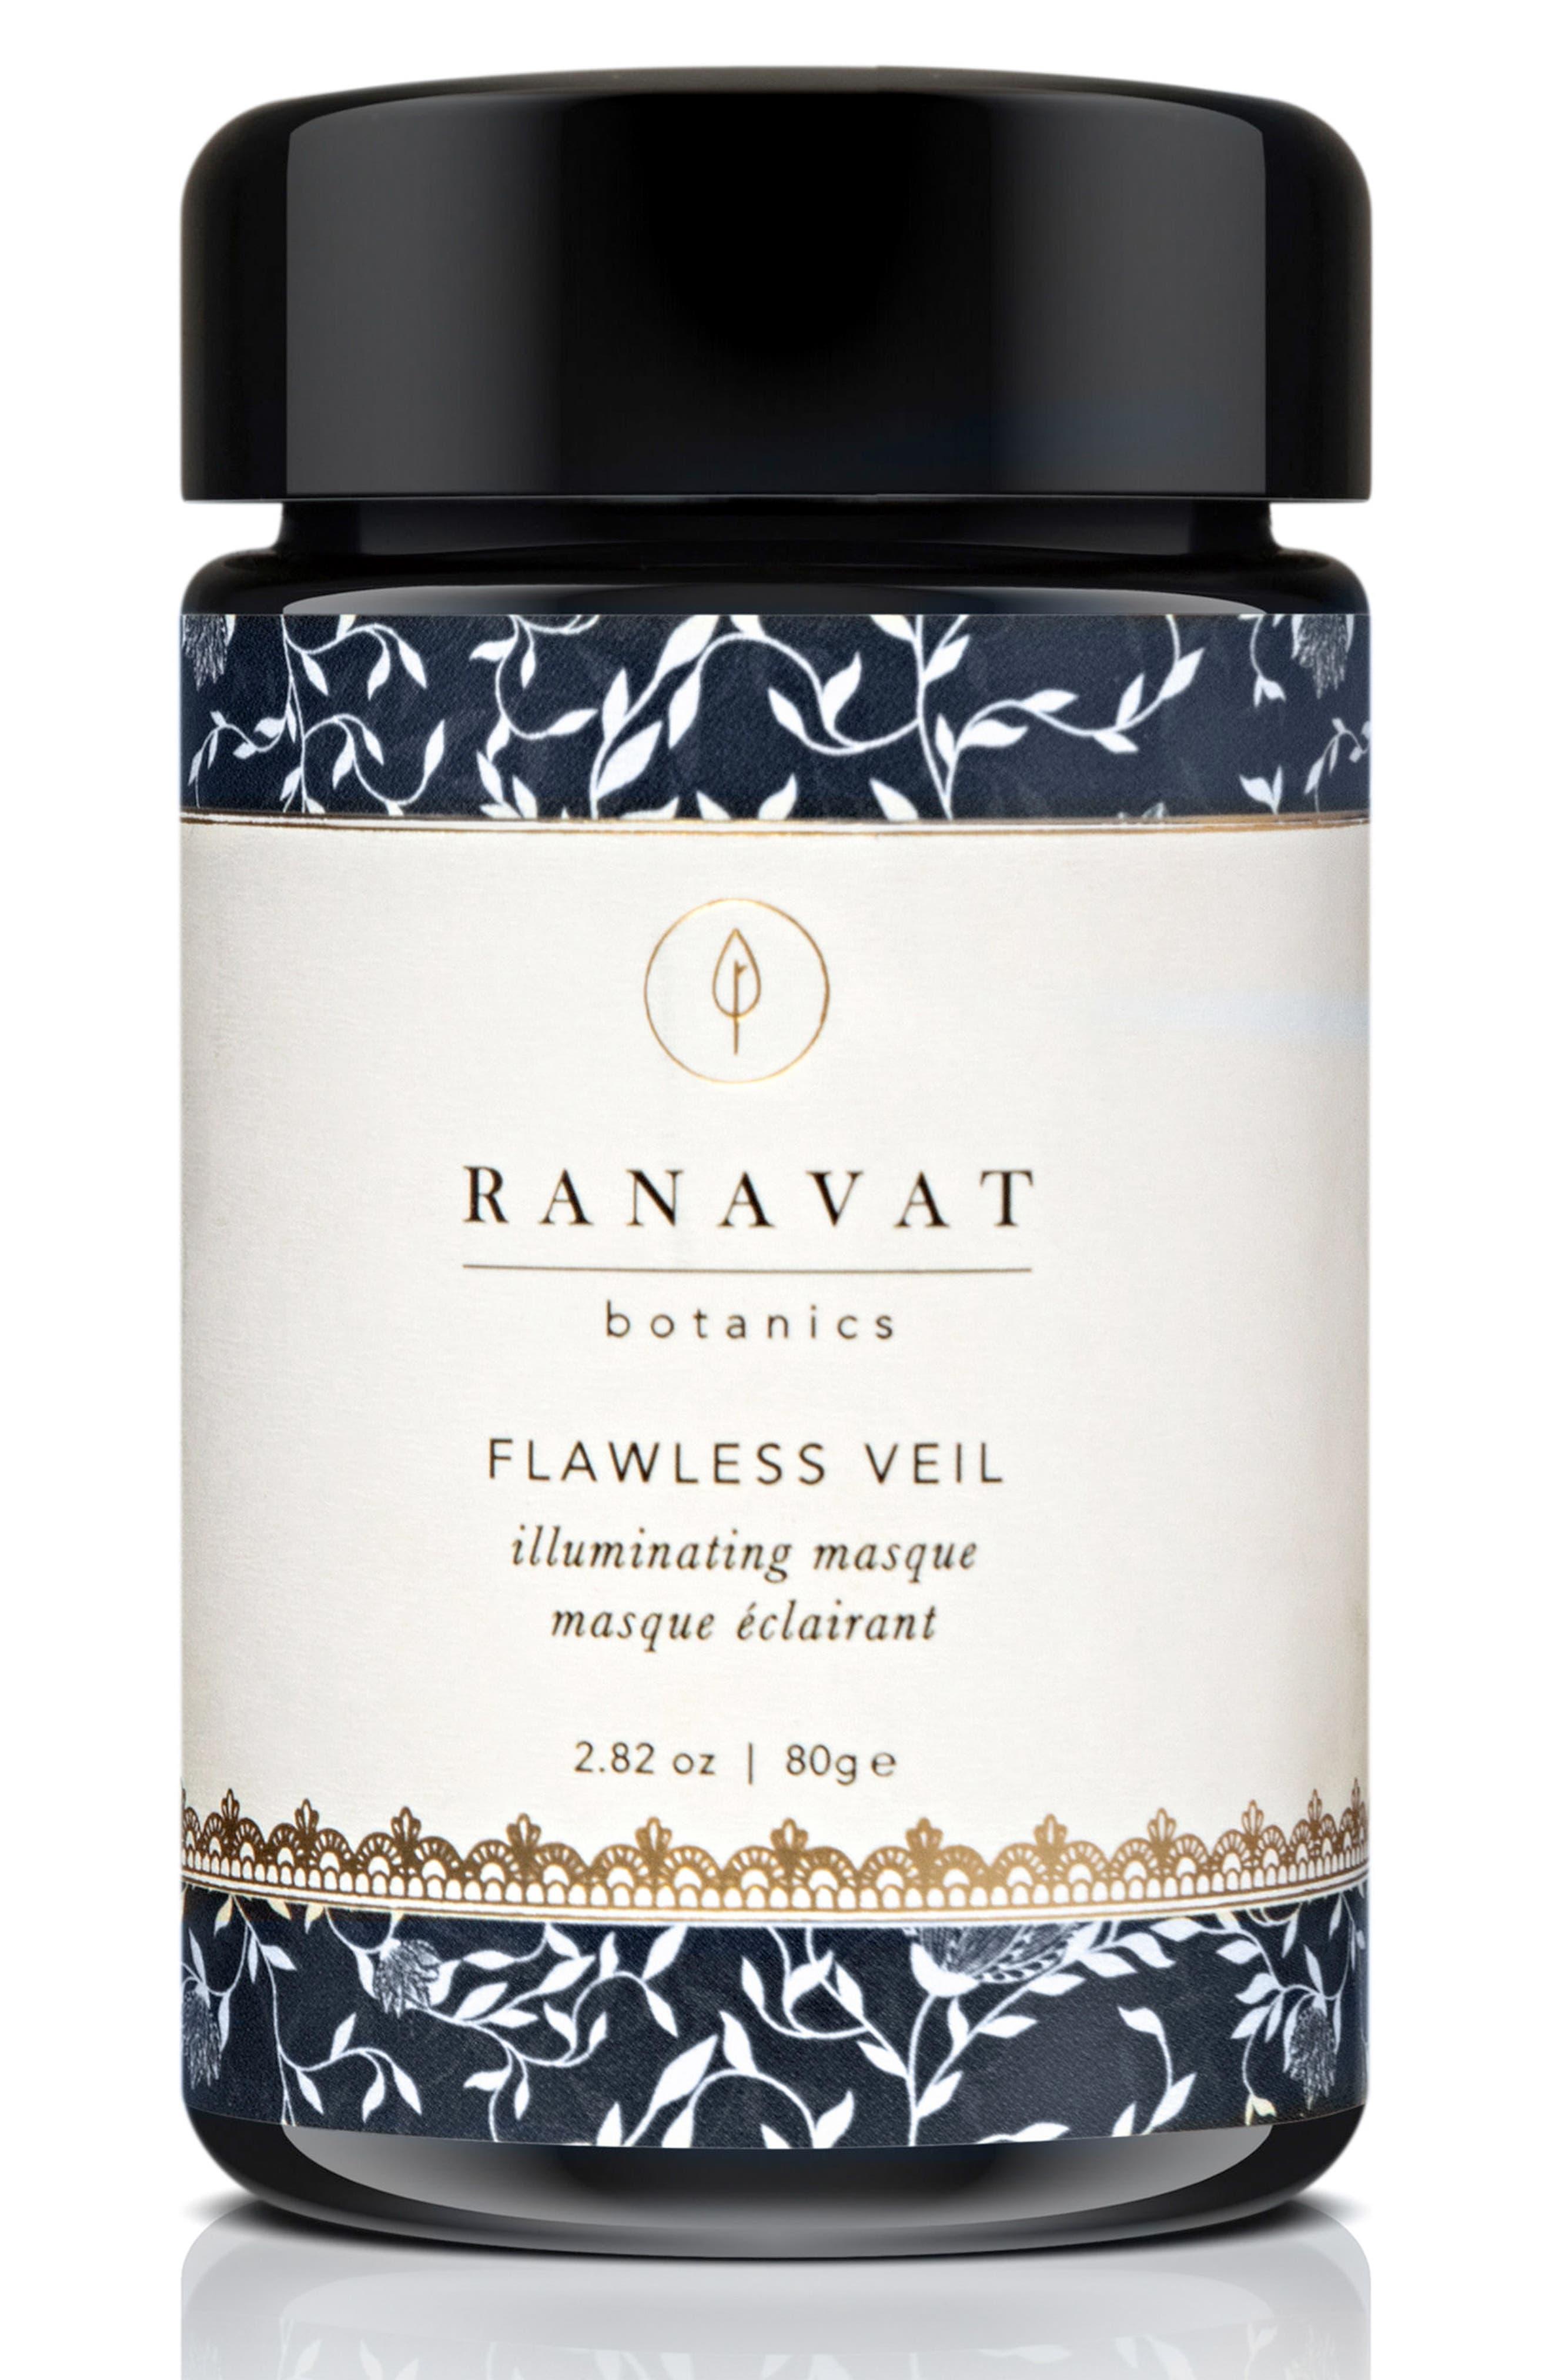 Ranavat Botanics Flawless Veil Illuminating Masque